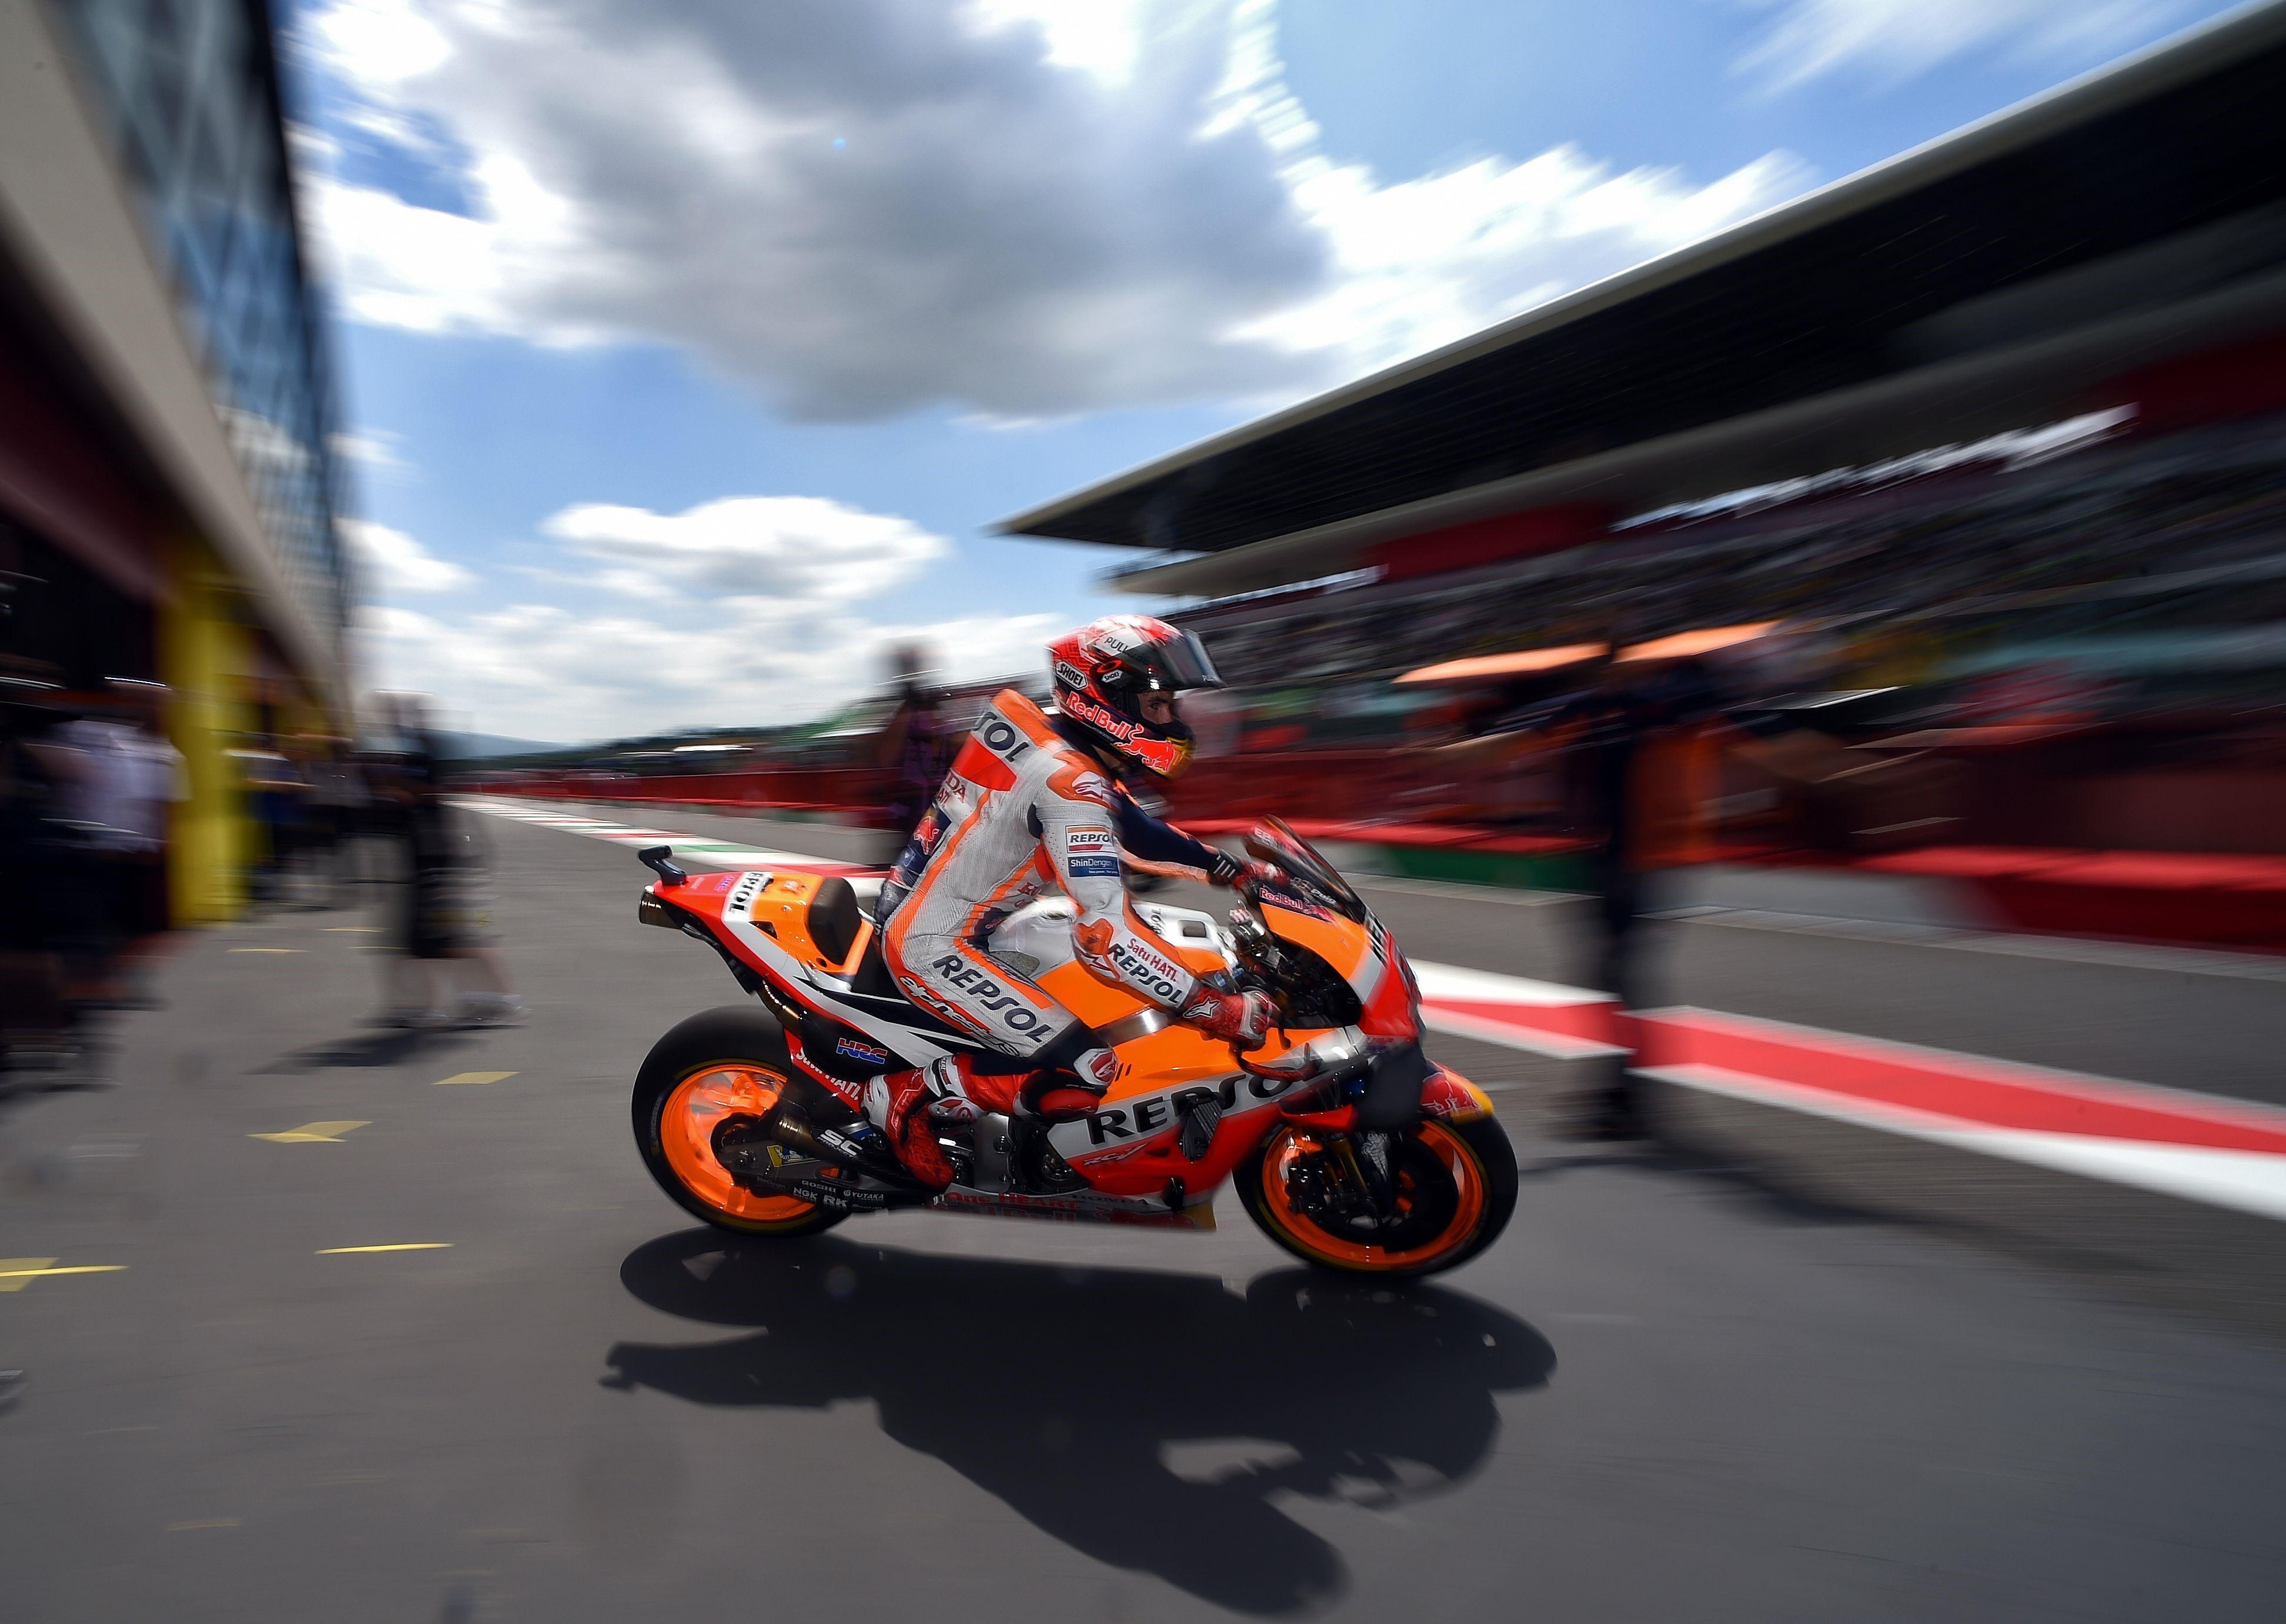 Marc Marquez (Honda HRC) au Grand Prix d'Italie 2018